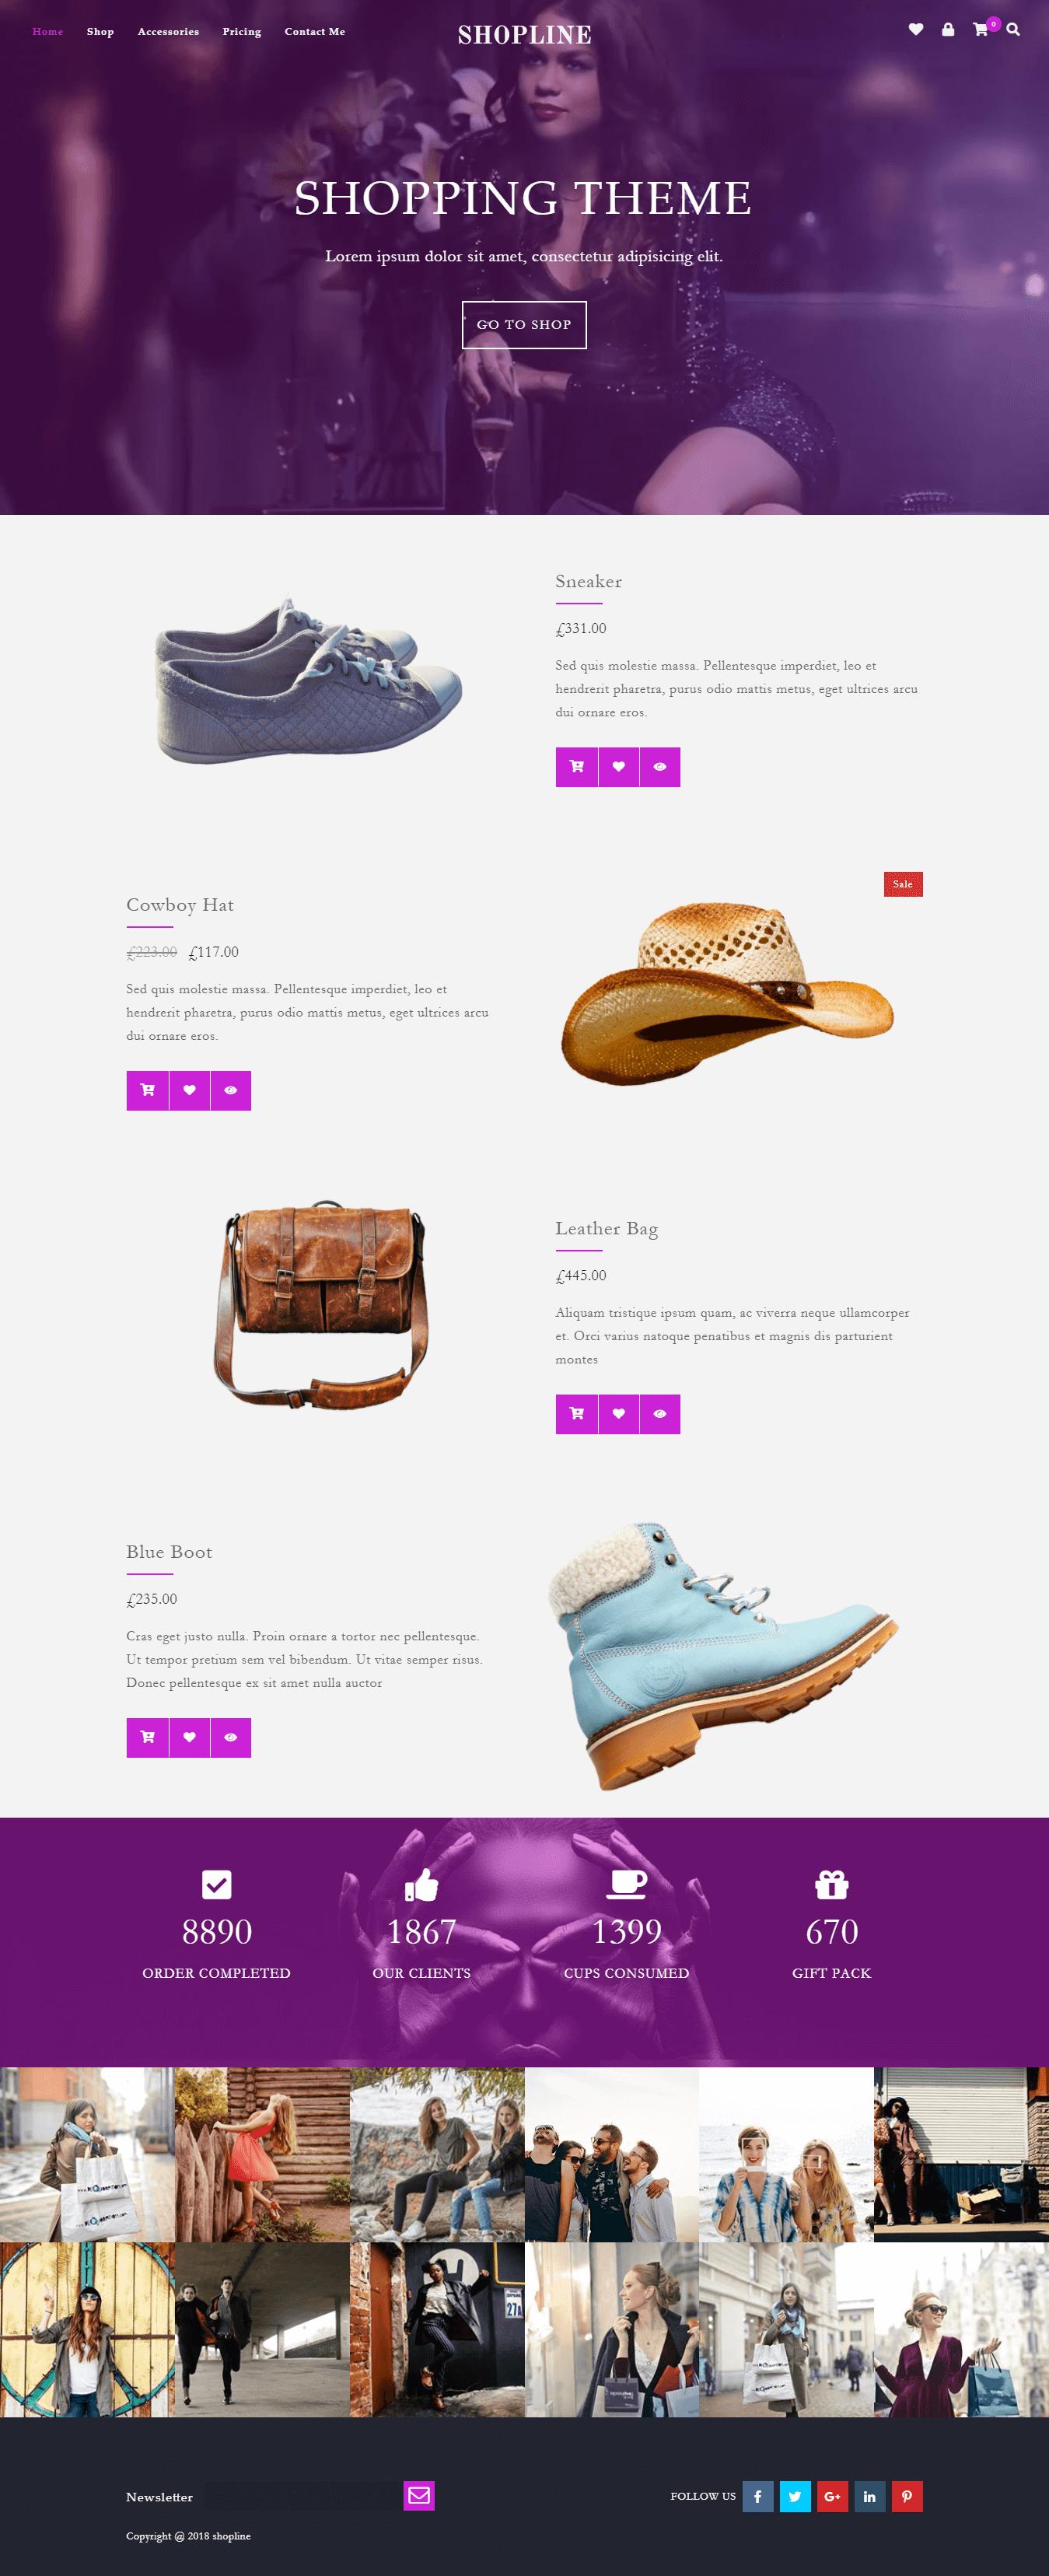 Shopline Pro Demo 5